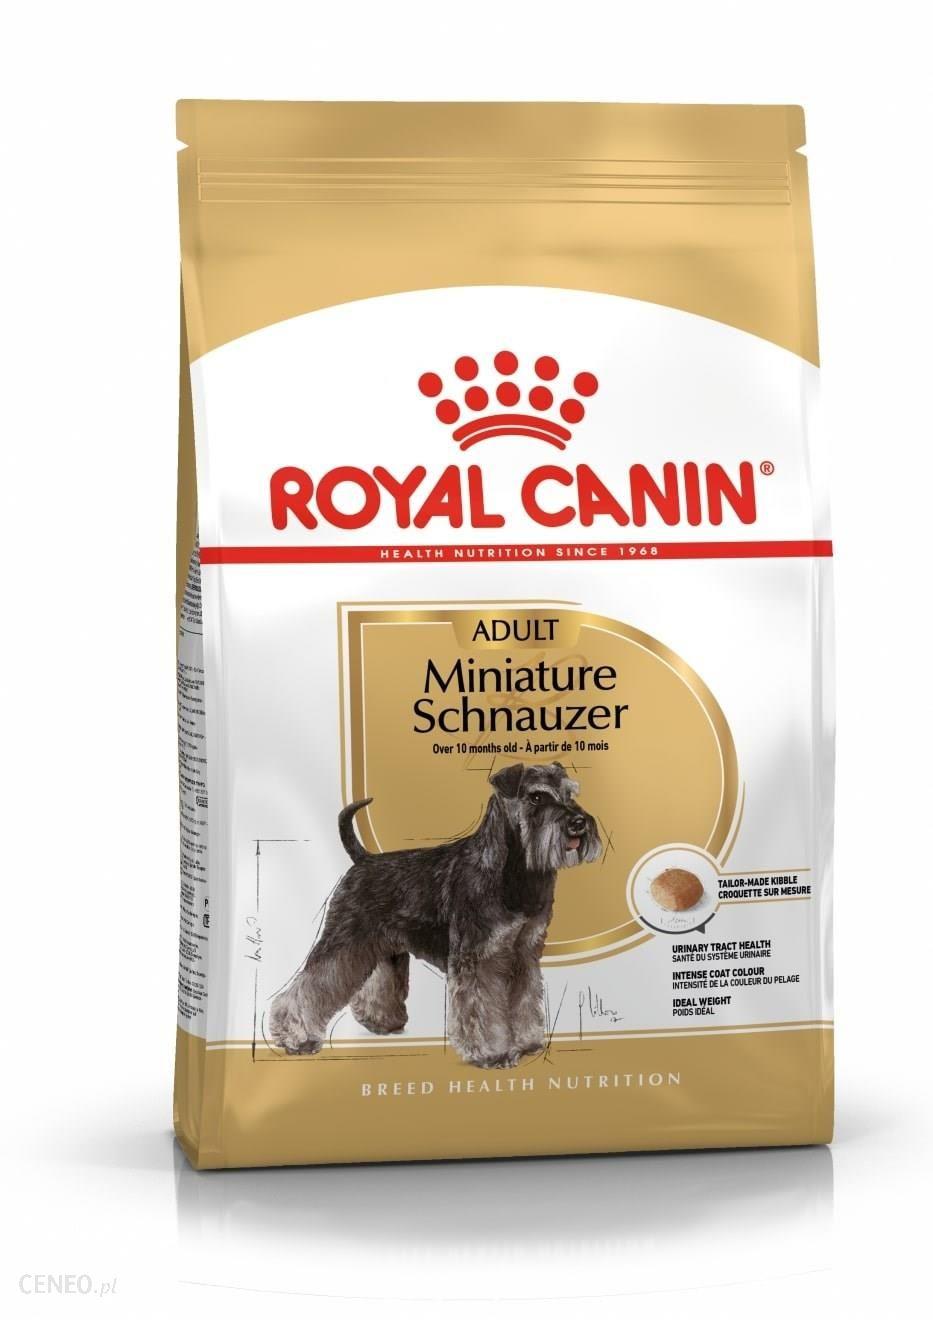 Royal Canin Miniature Schnauzer Adult 500g